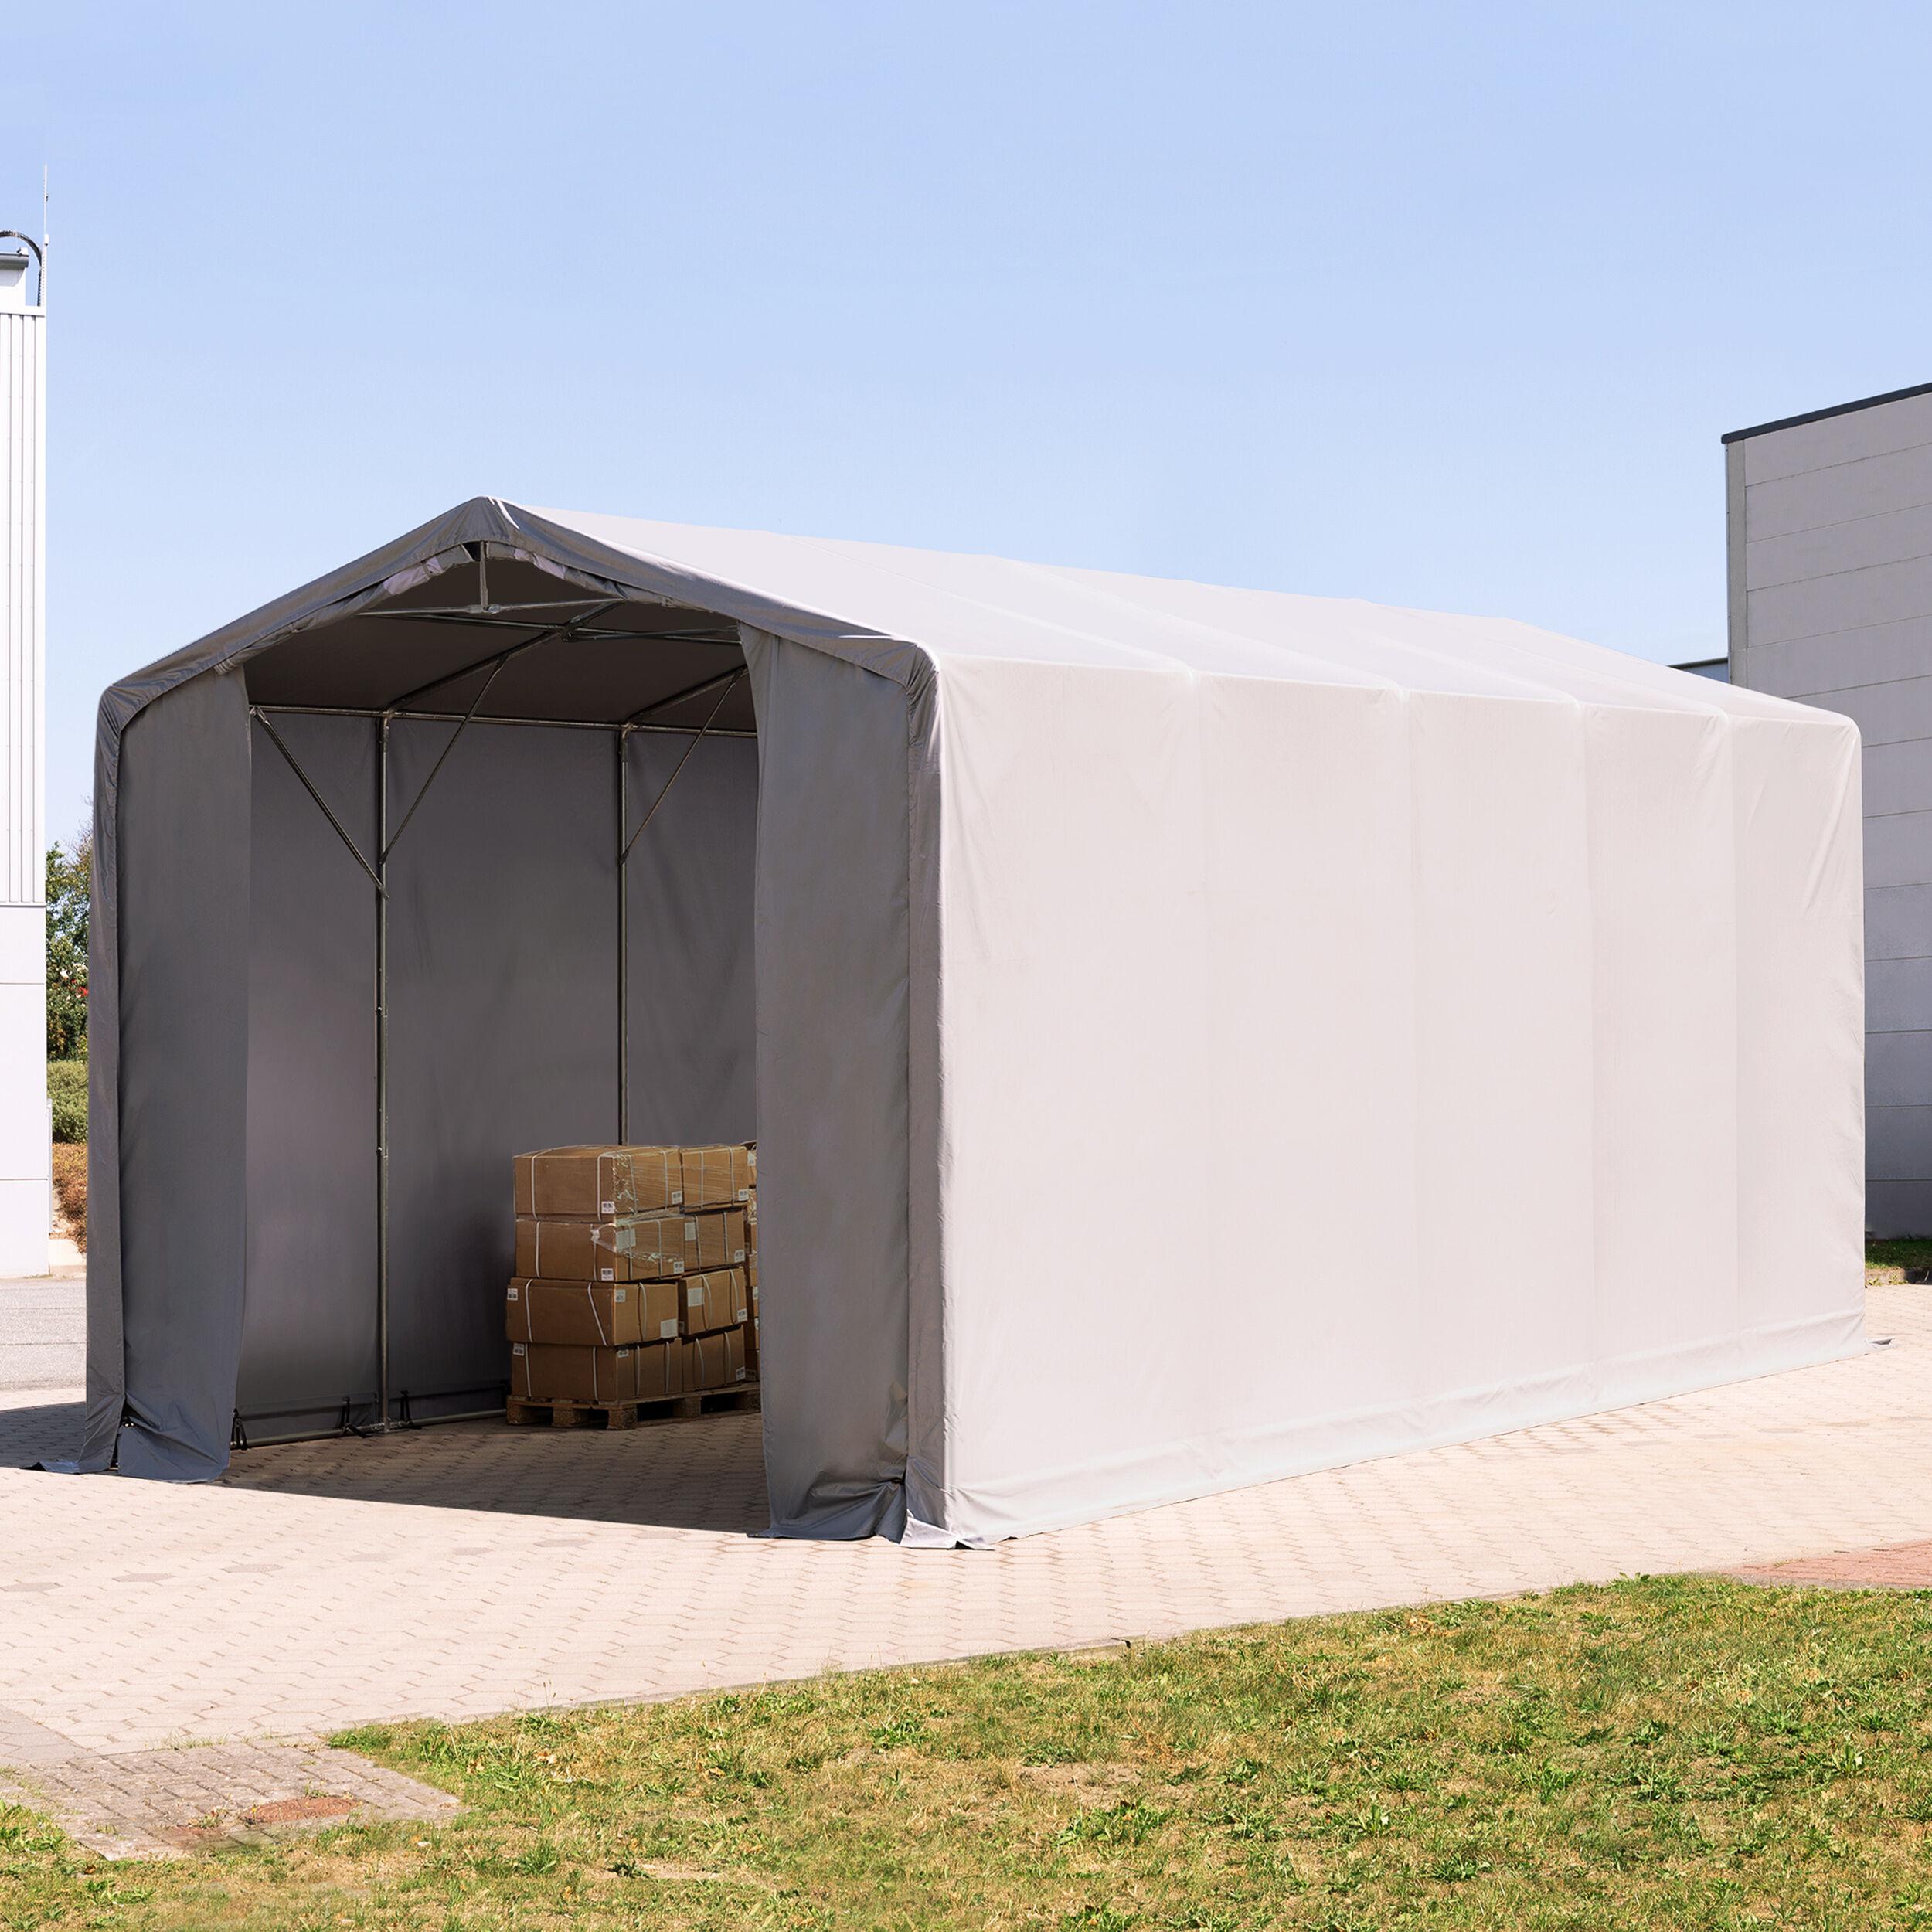 TOOLPORT Industrial Tent 5x10m PVC 720 g/m² grey waterproof